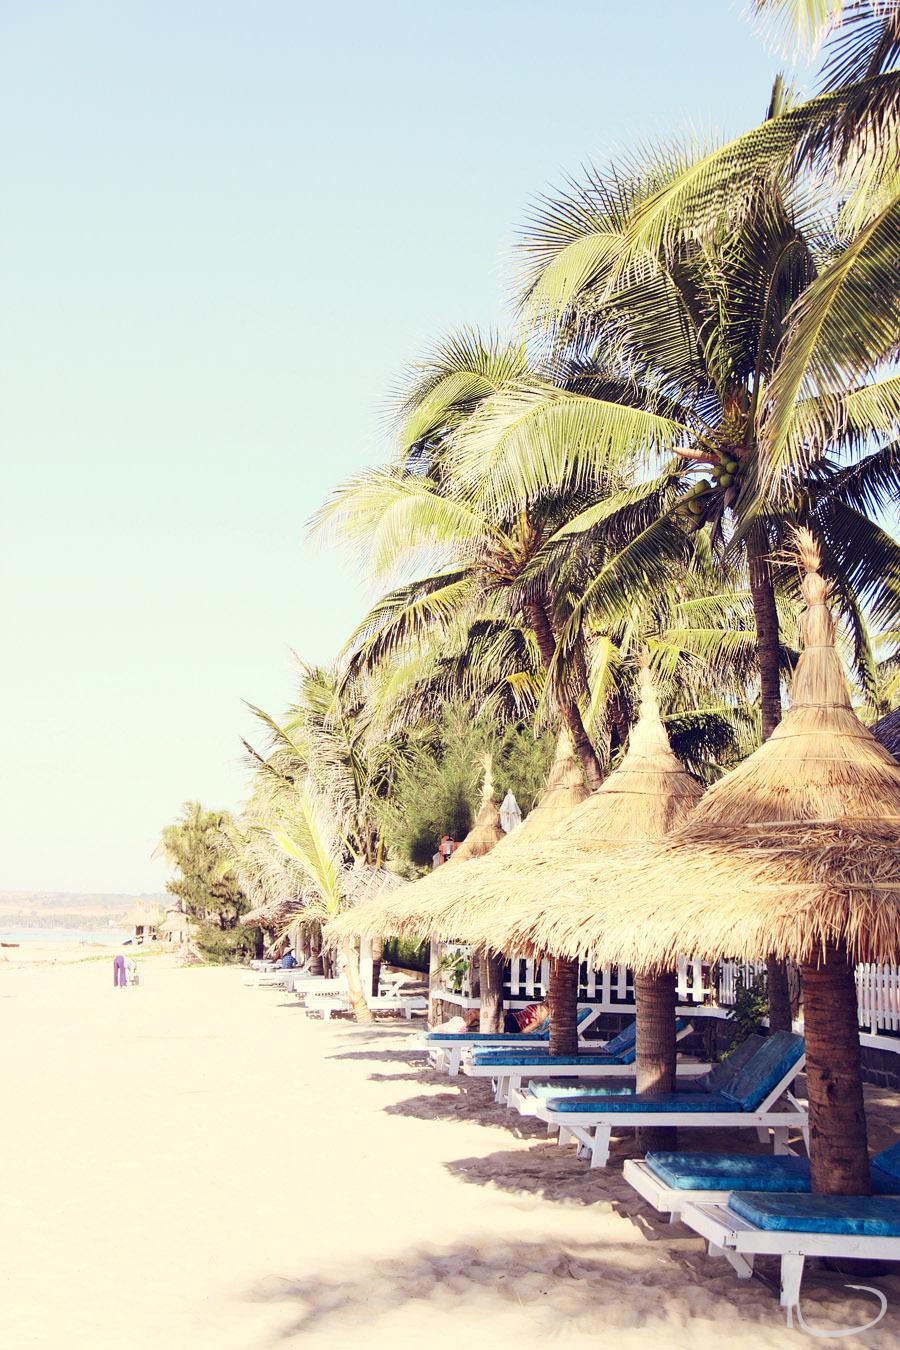 Vietnam Wedding Photographer: Straw umbrellas on beach